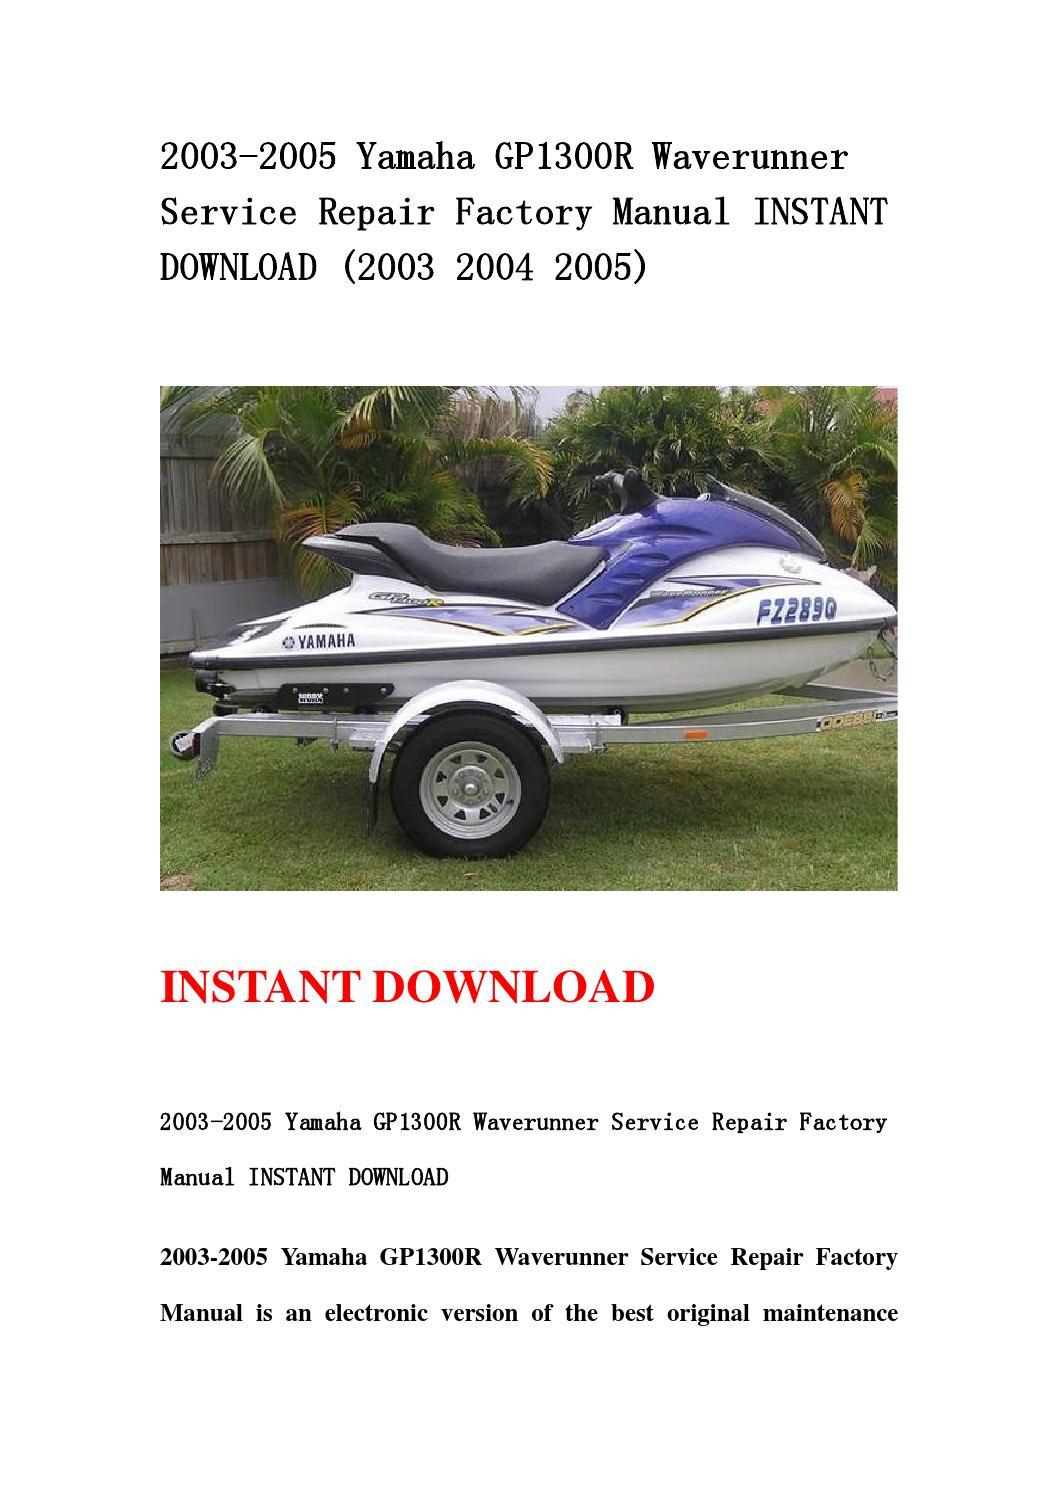 2003 2005 Yamaha Gp1300r Waverunner Service Repair Factory border=